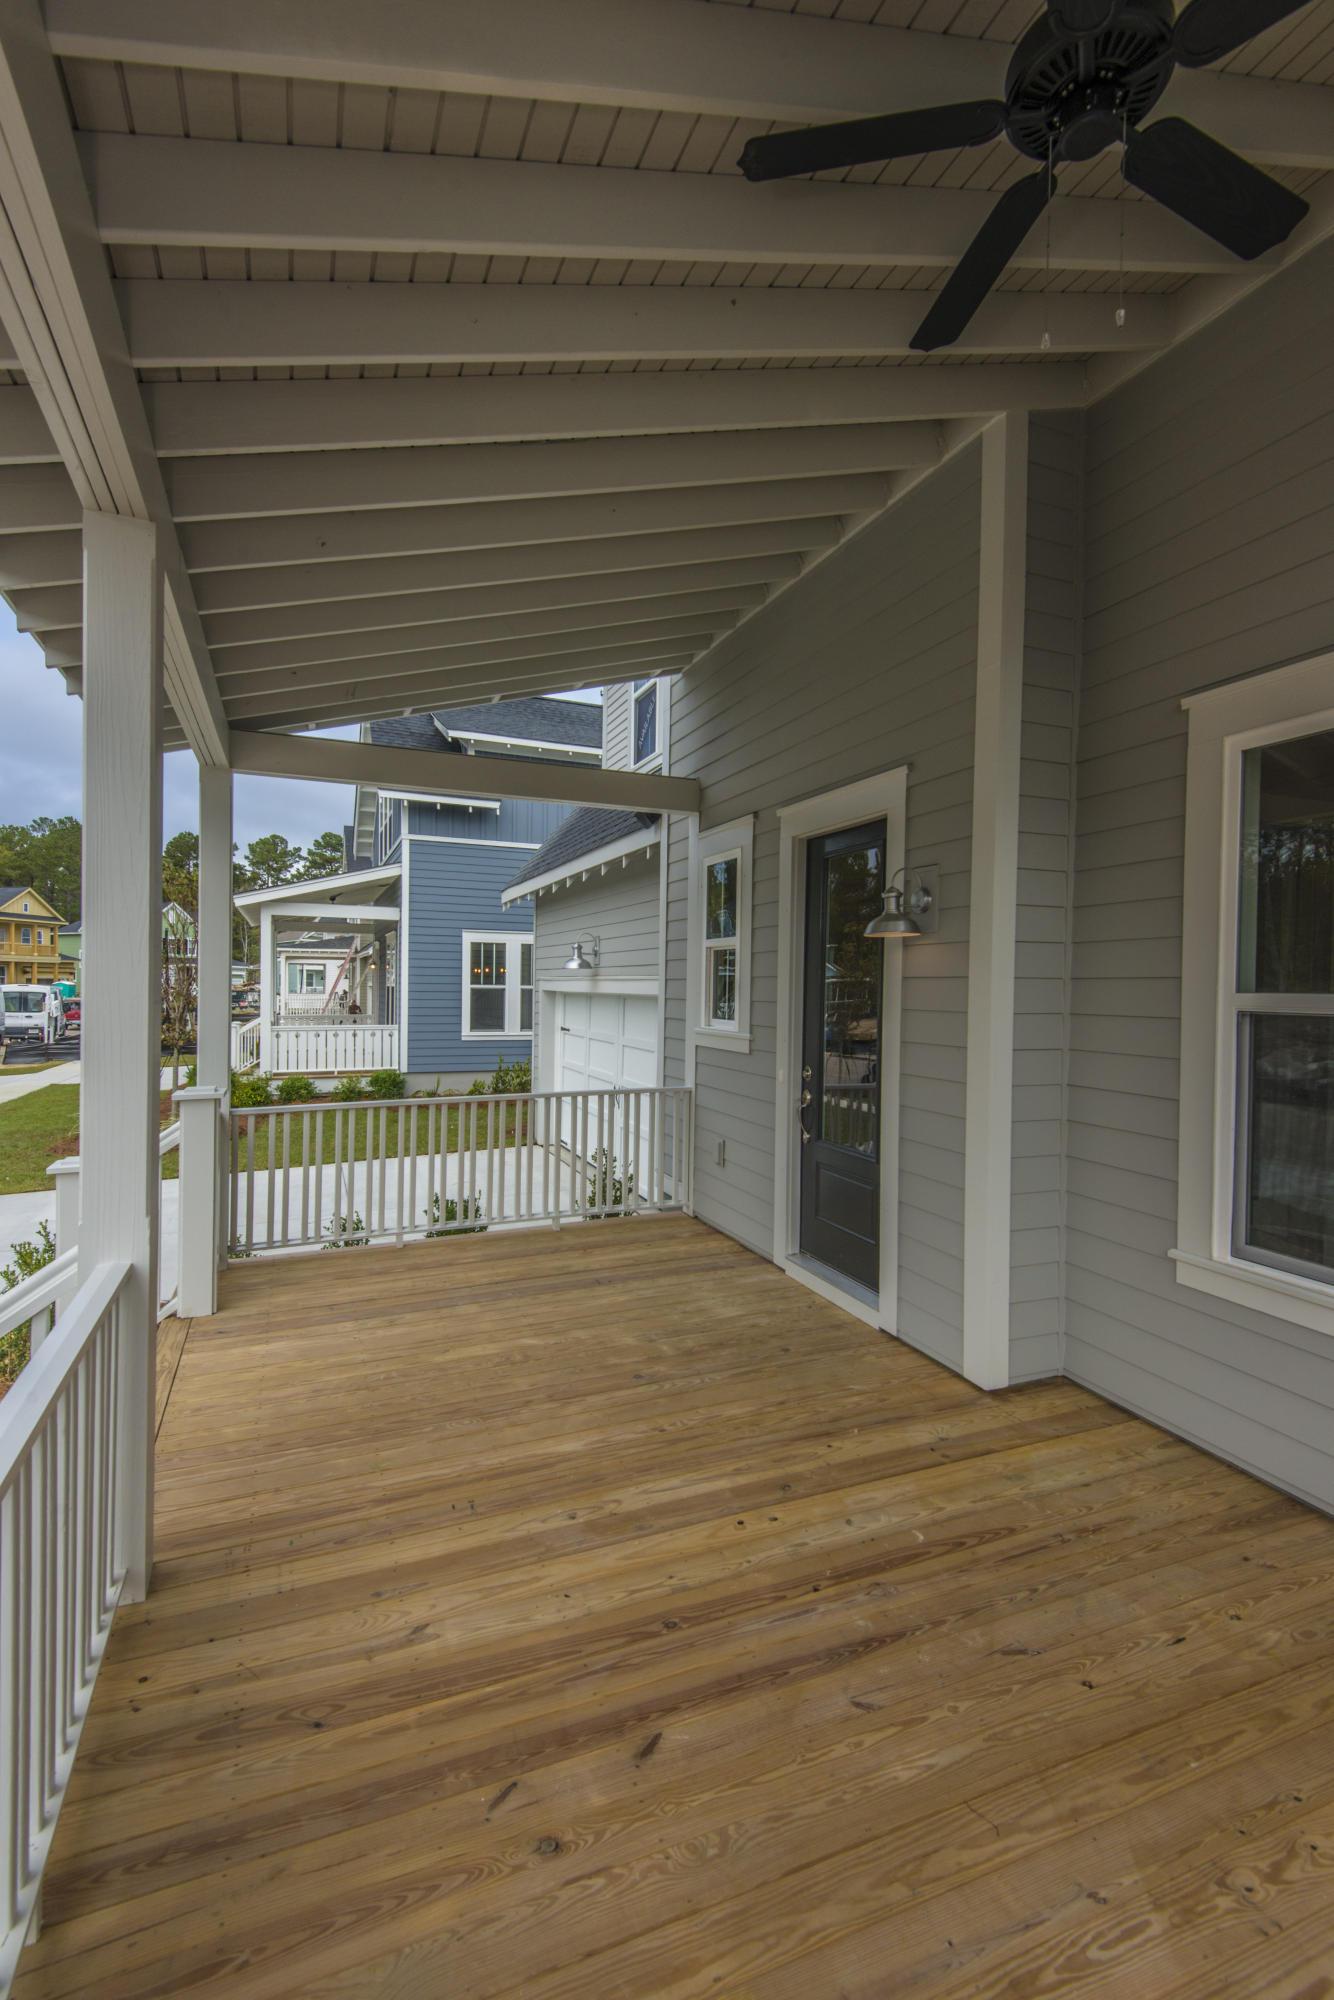 Carolina Park Homes For Sale - 3527 Wilkes, Mount Pleasant, SC - 36